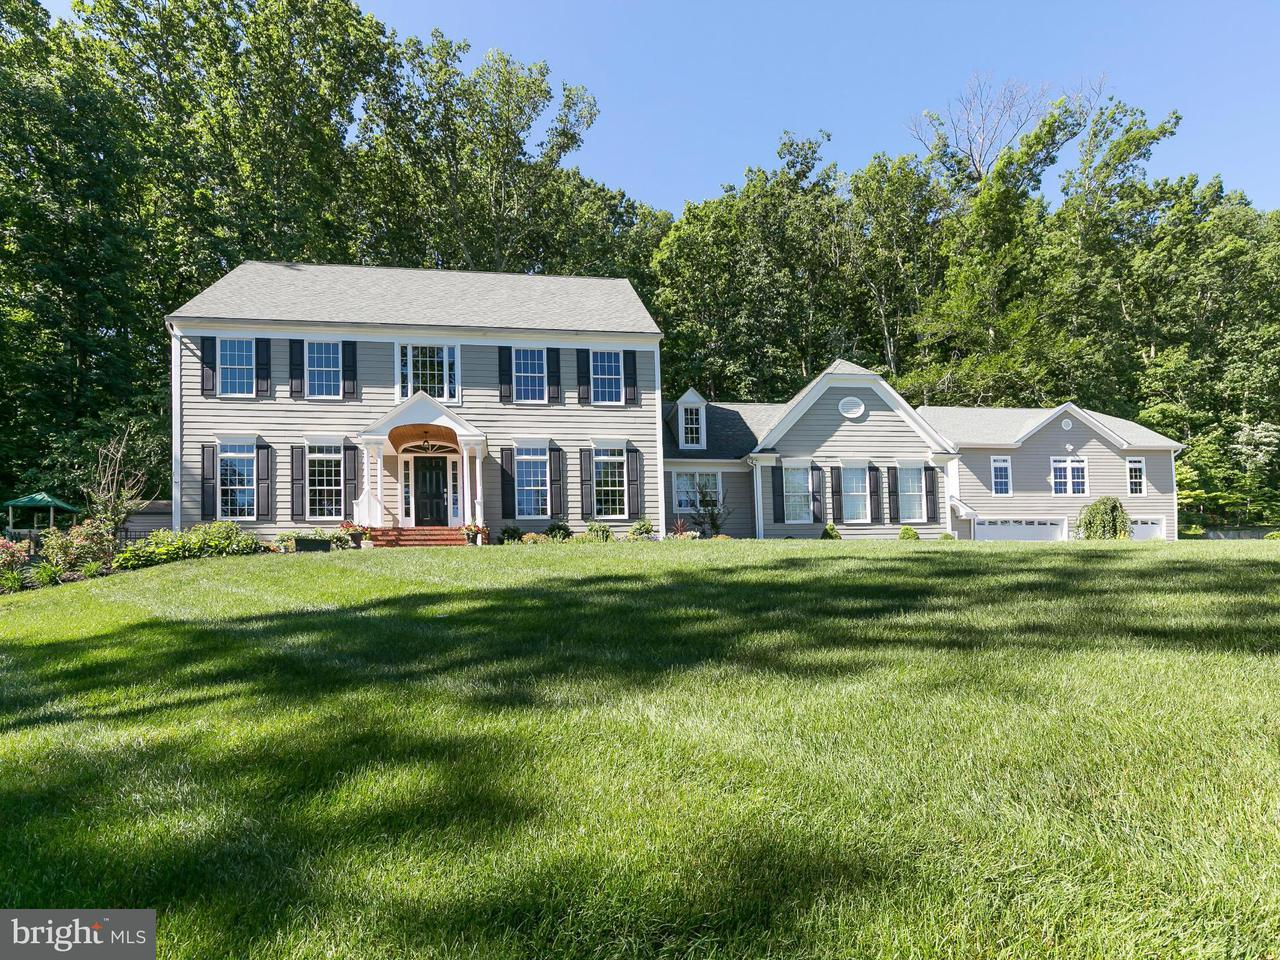 獨棟家庭住宅 為 出售 在 949 PINEY HILL Road 949 PINEY HILL Road Monkton, 馬里蘭州 21111 美國